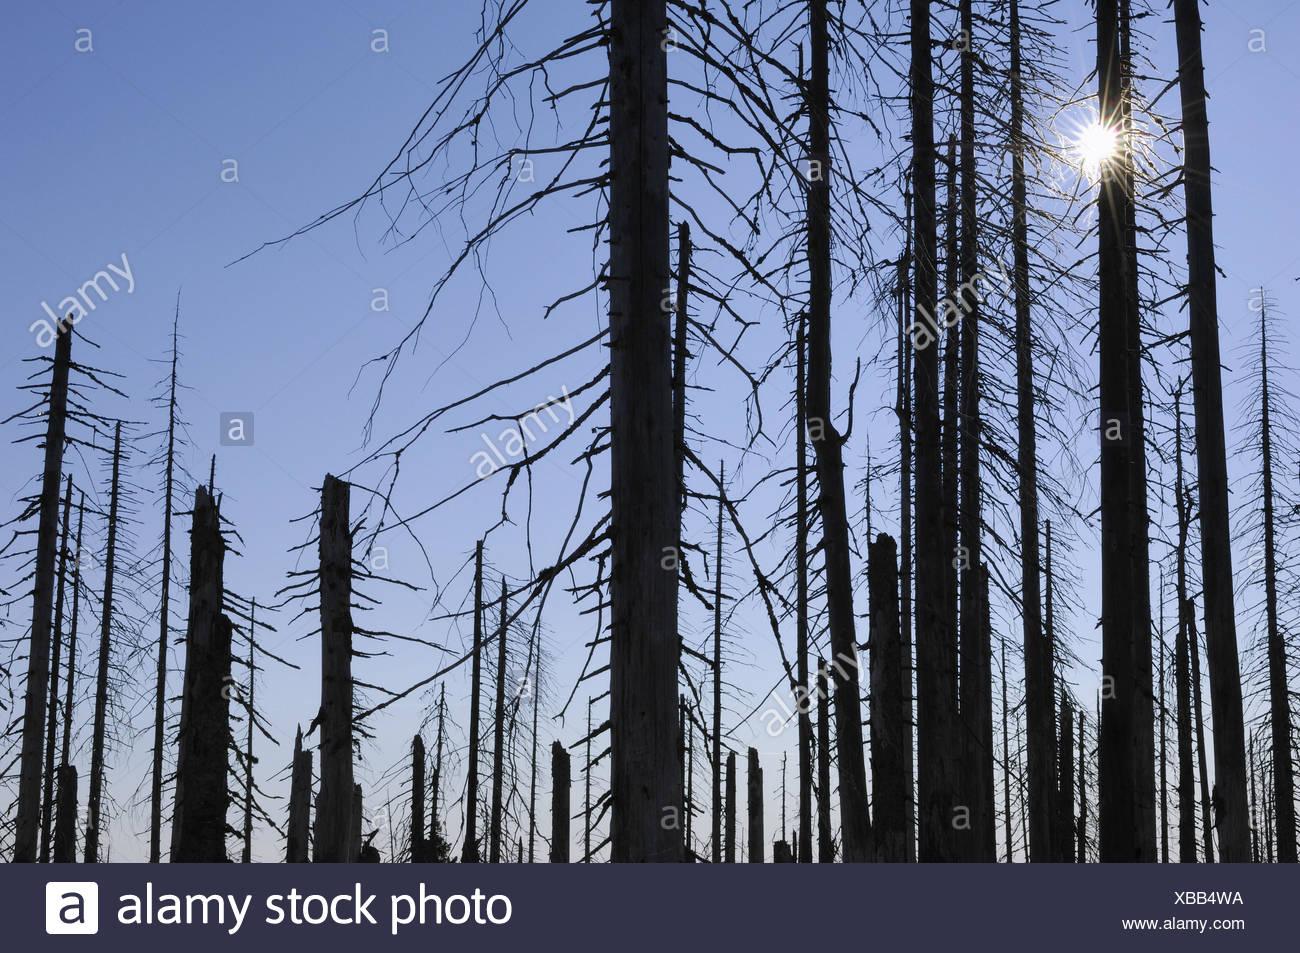 Forest, forest decline, bark beetle infestation, bare, sun, - Stock Image